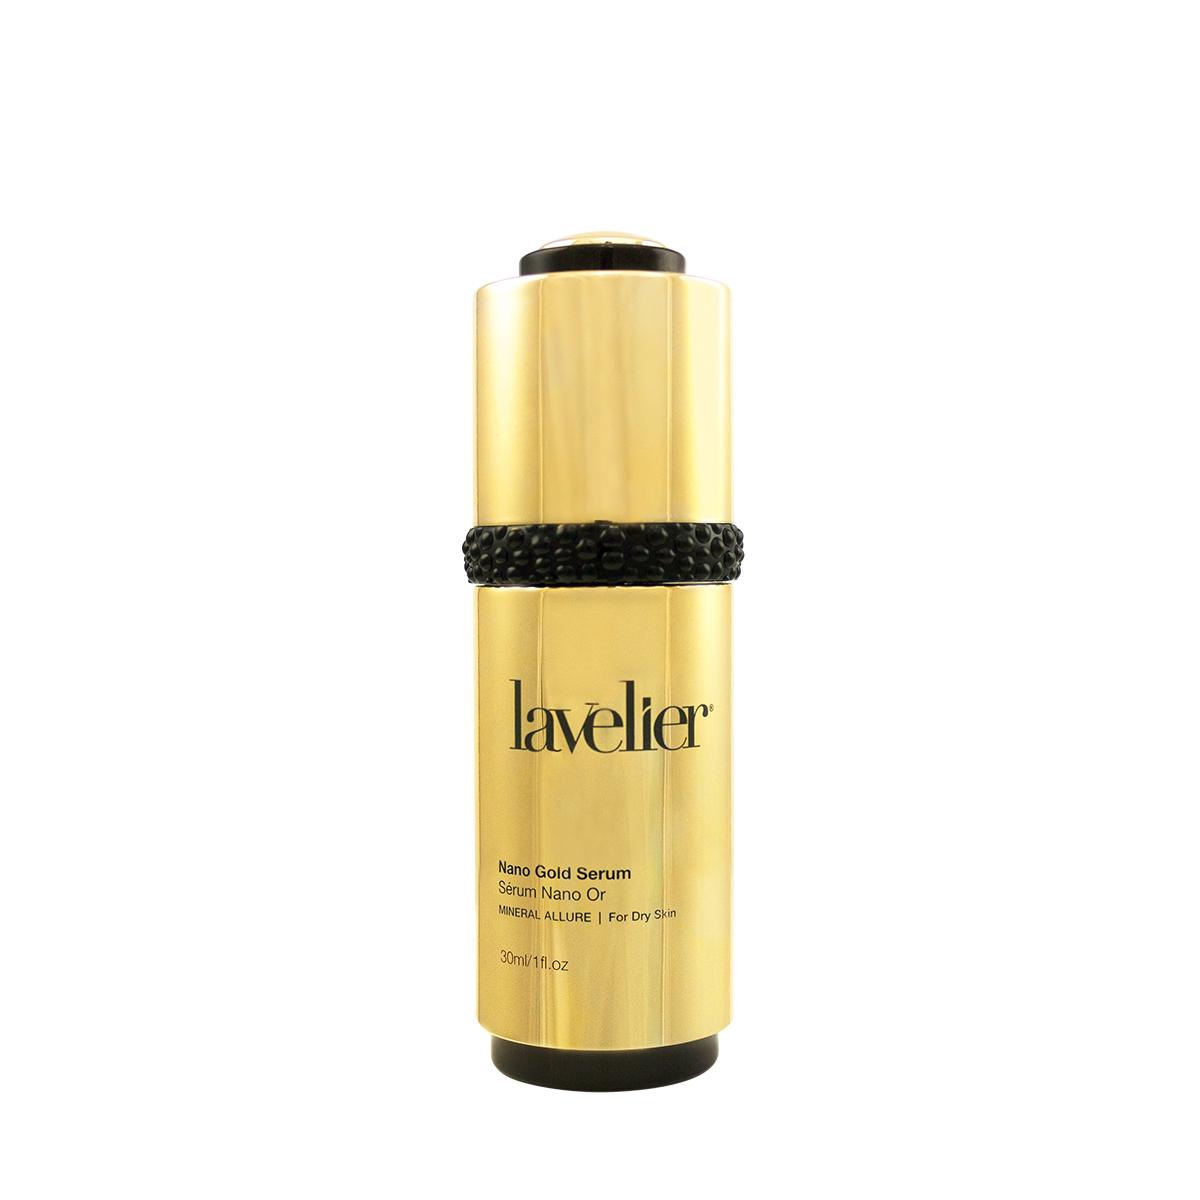 Lavelier Mineral Allure Nano Gold Serum Bottle Front